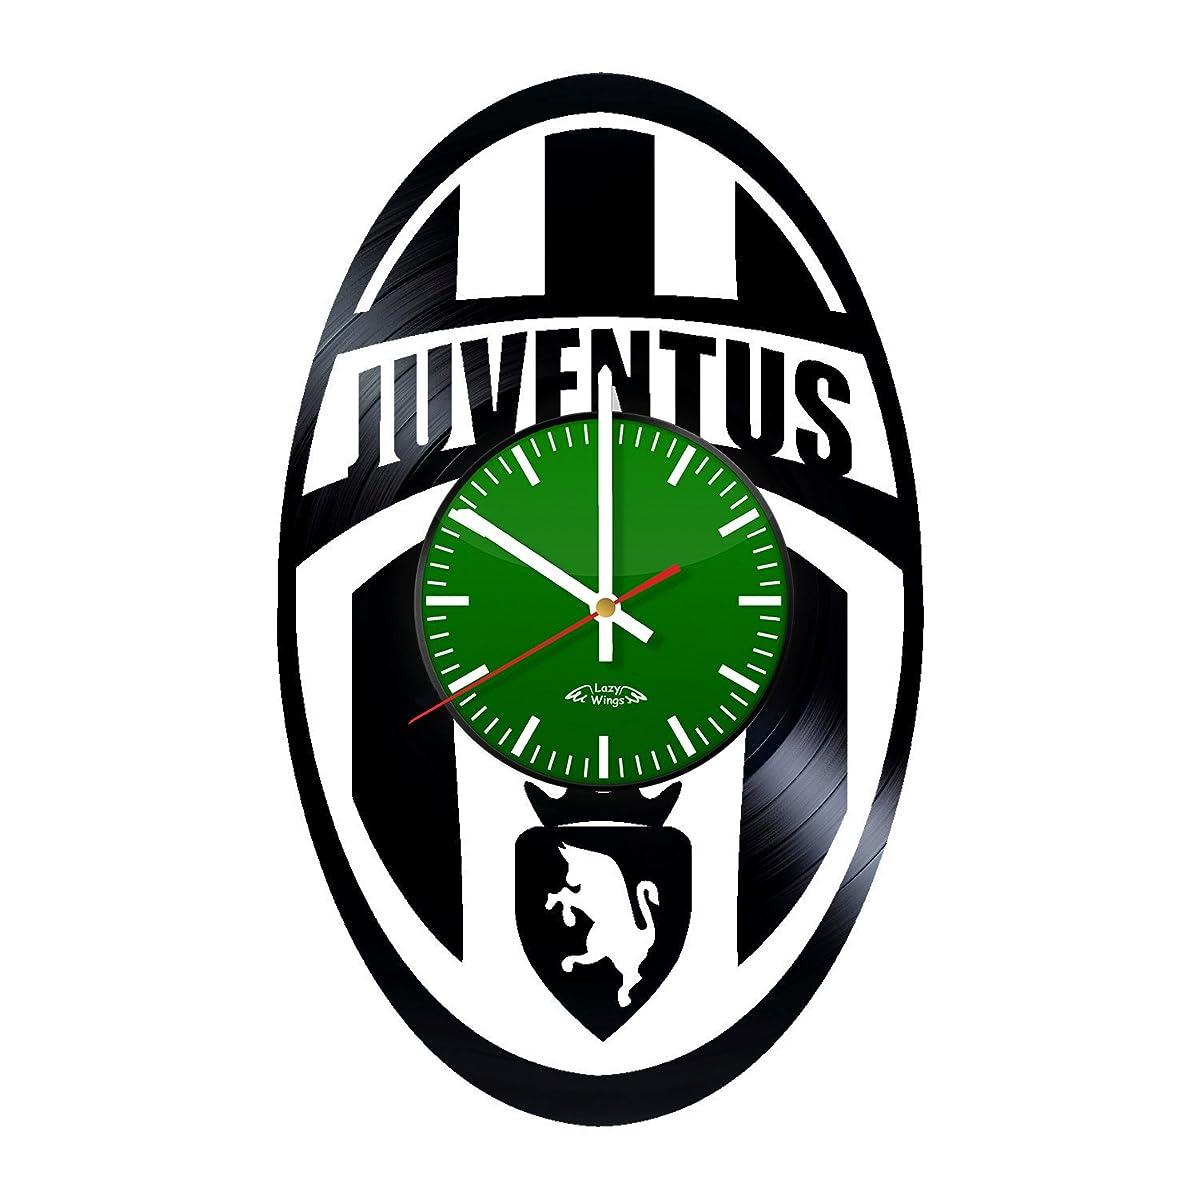 Soccer Club Logo Design Vinyl Record Wall Clock - Gift Idea for men or boys - Contemporary home wall art decoration